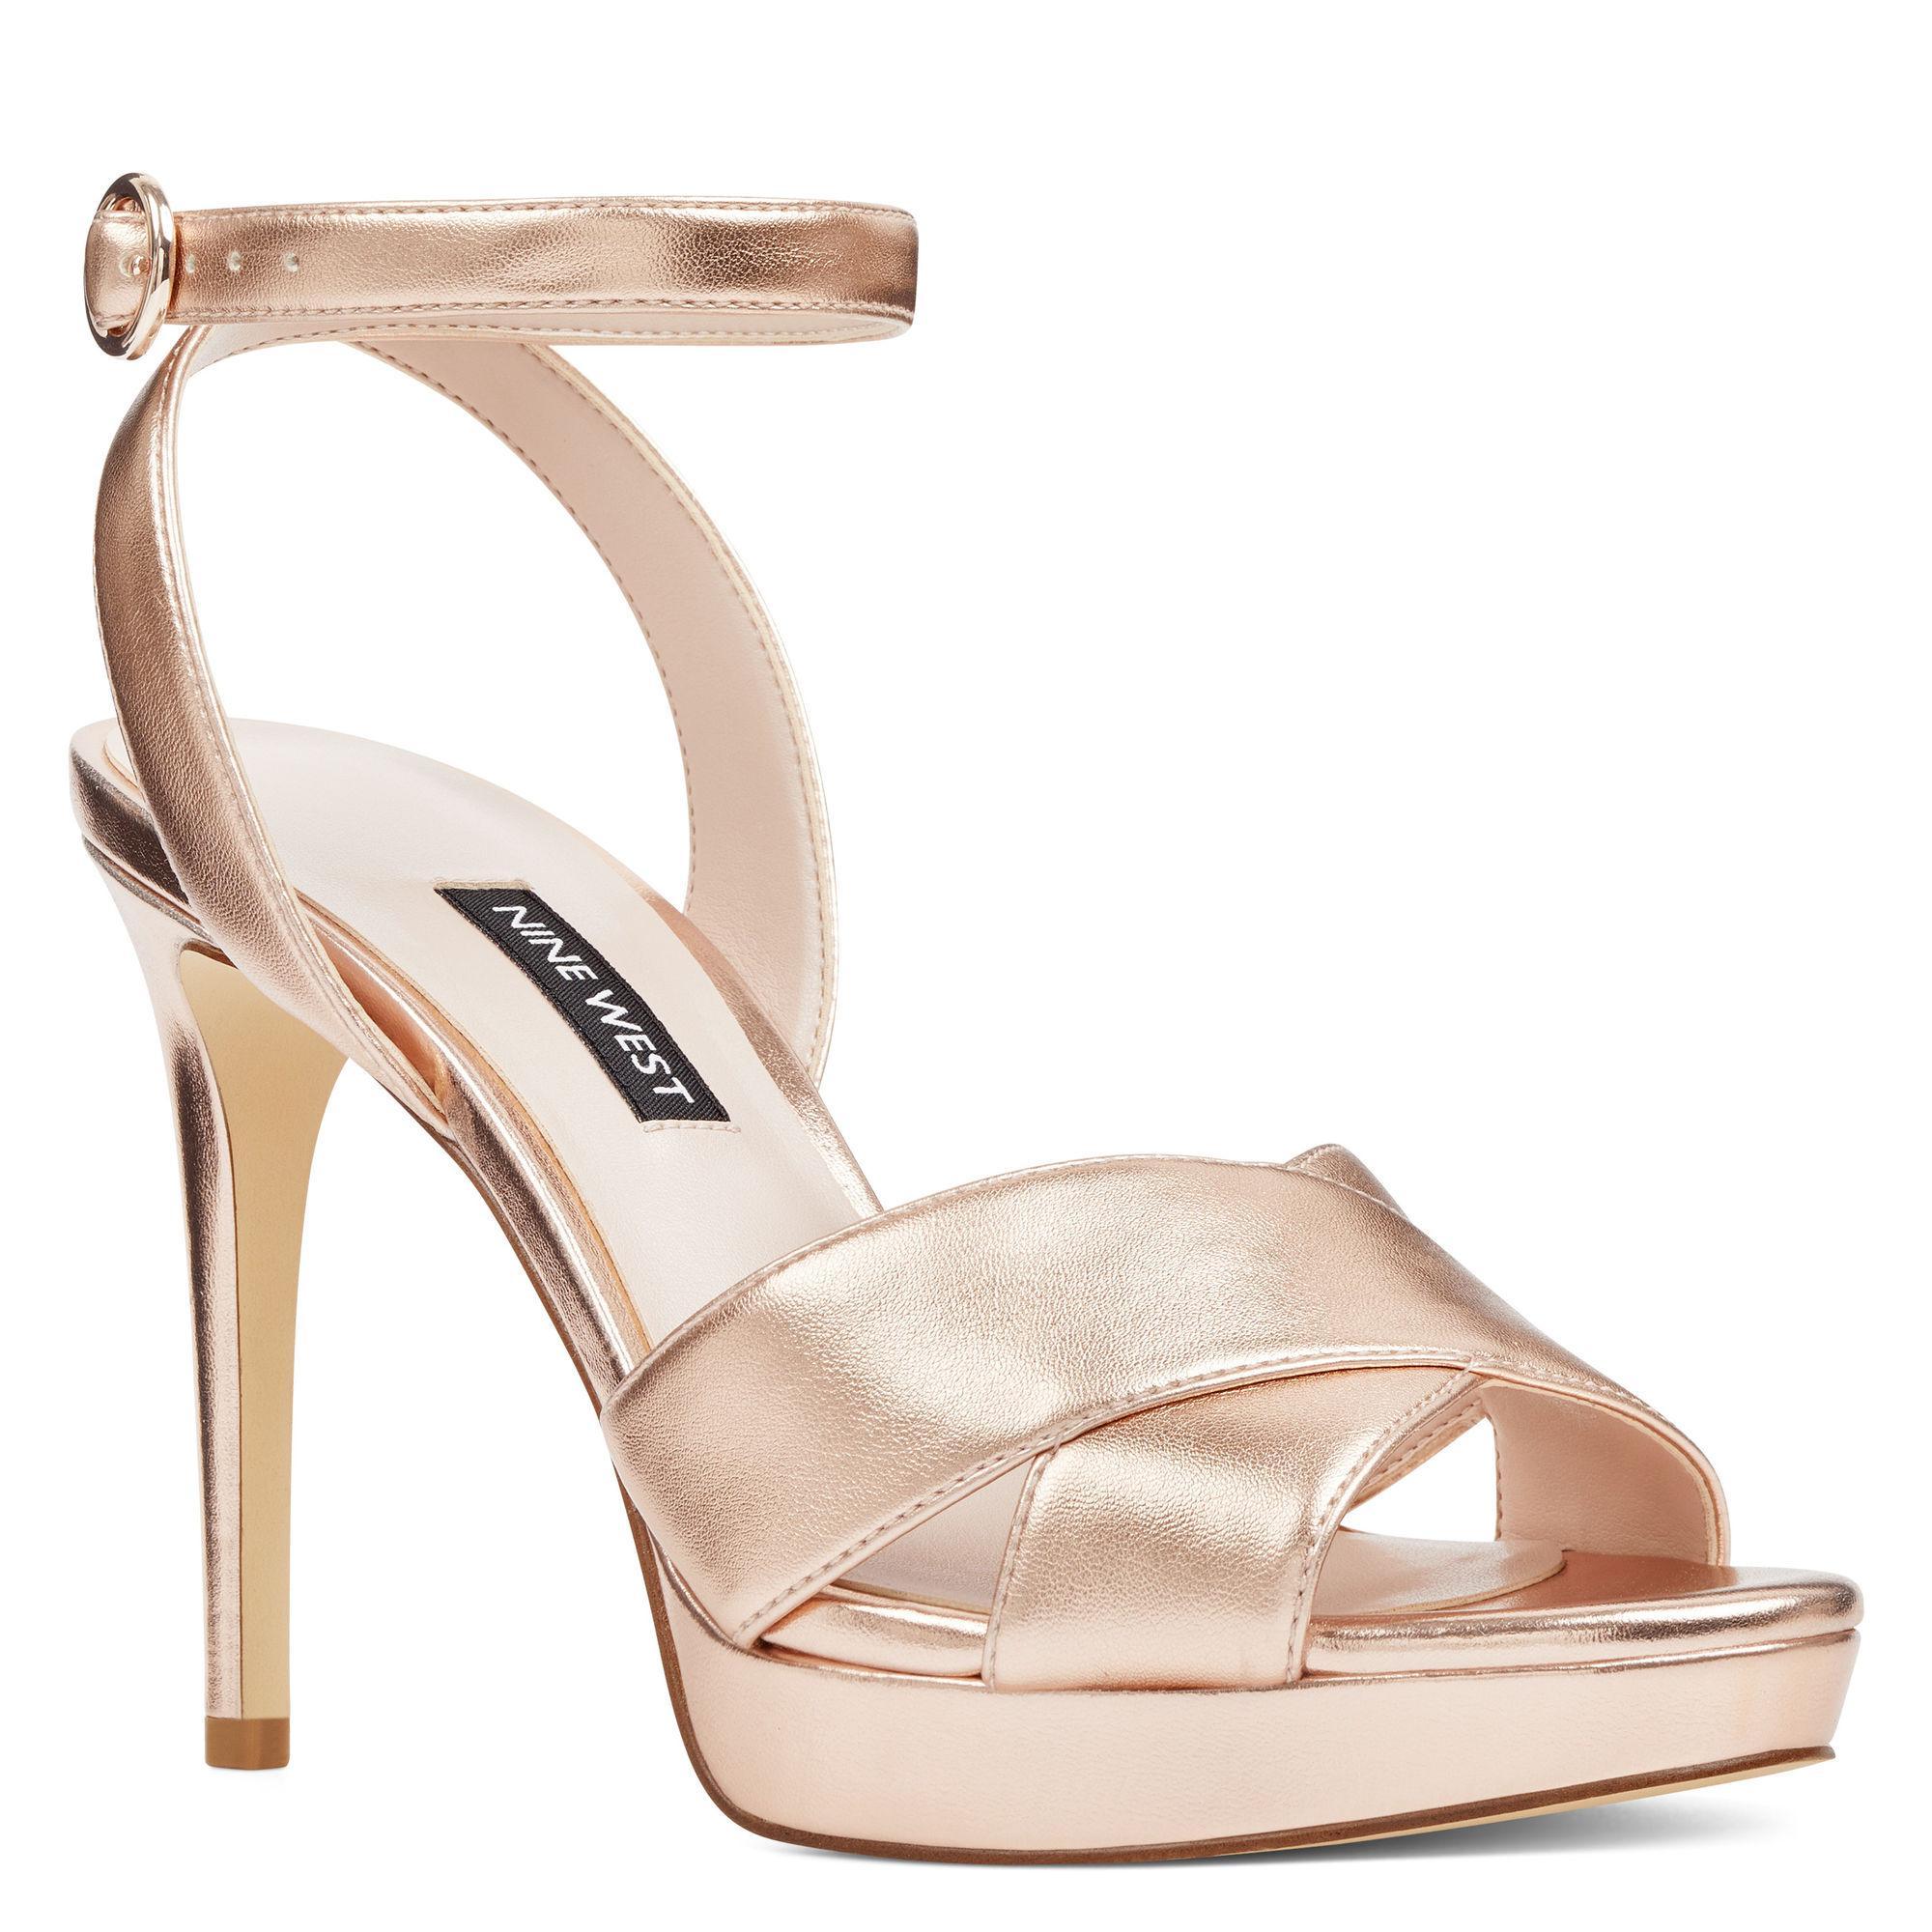 a31fbab1b498 Lyst - Nine West Quisha Ankle Strap Sandals